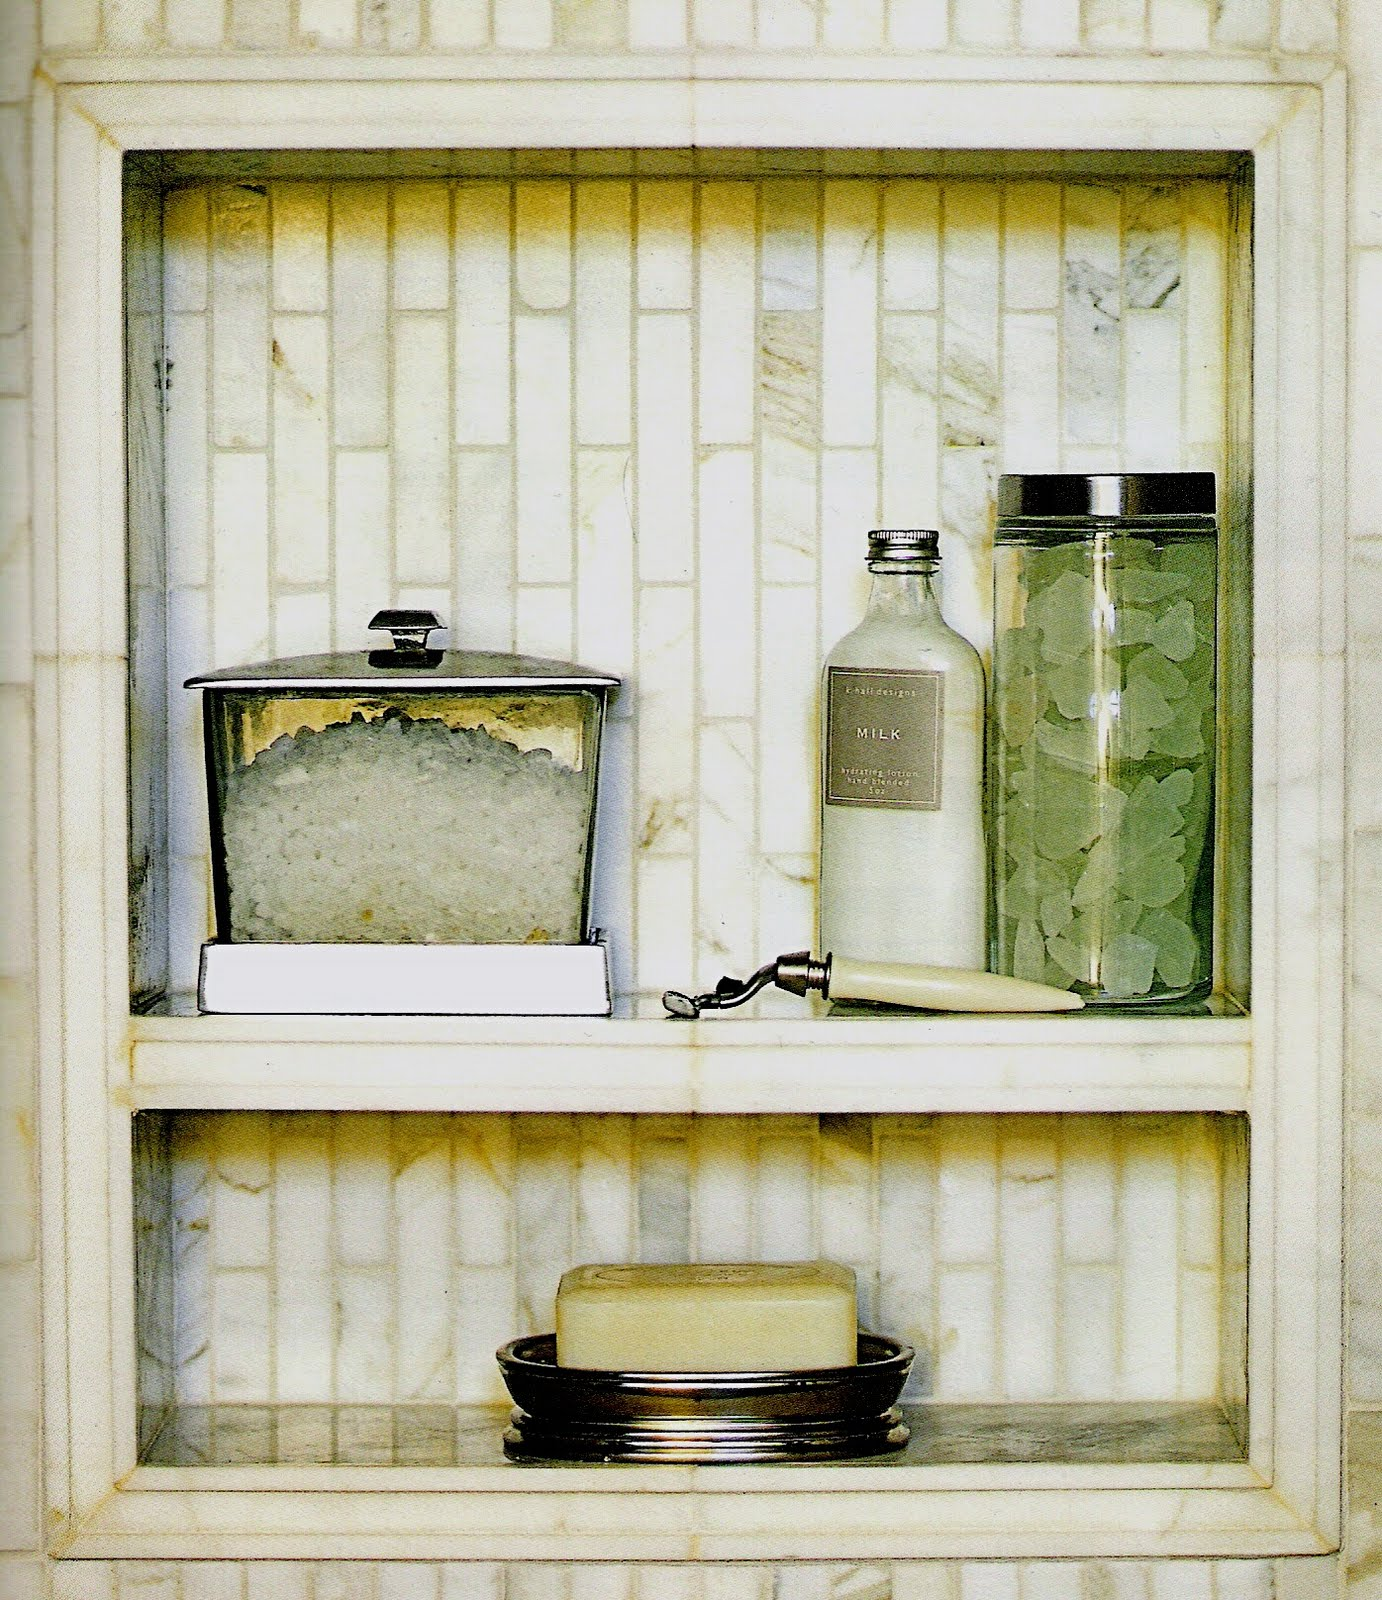 Design daily the shower niche for Bathroom niche design